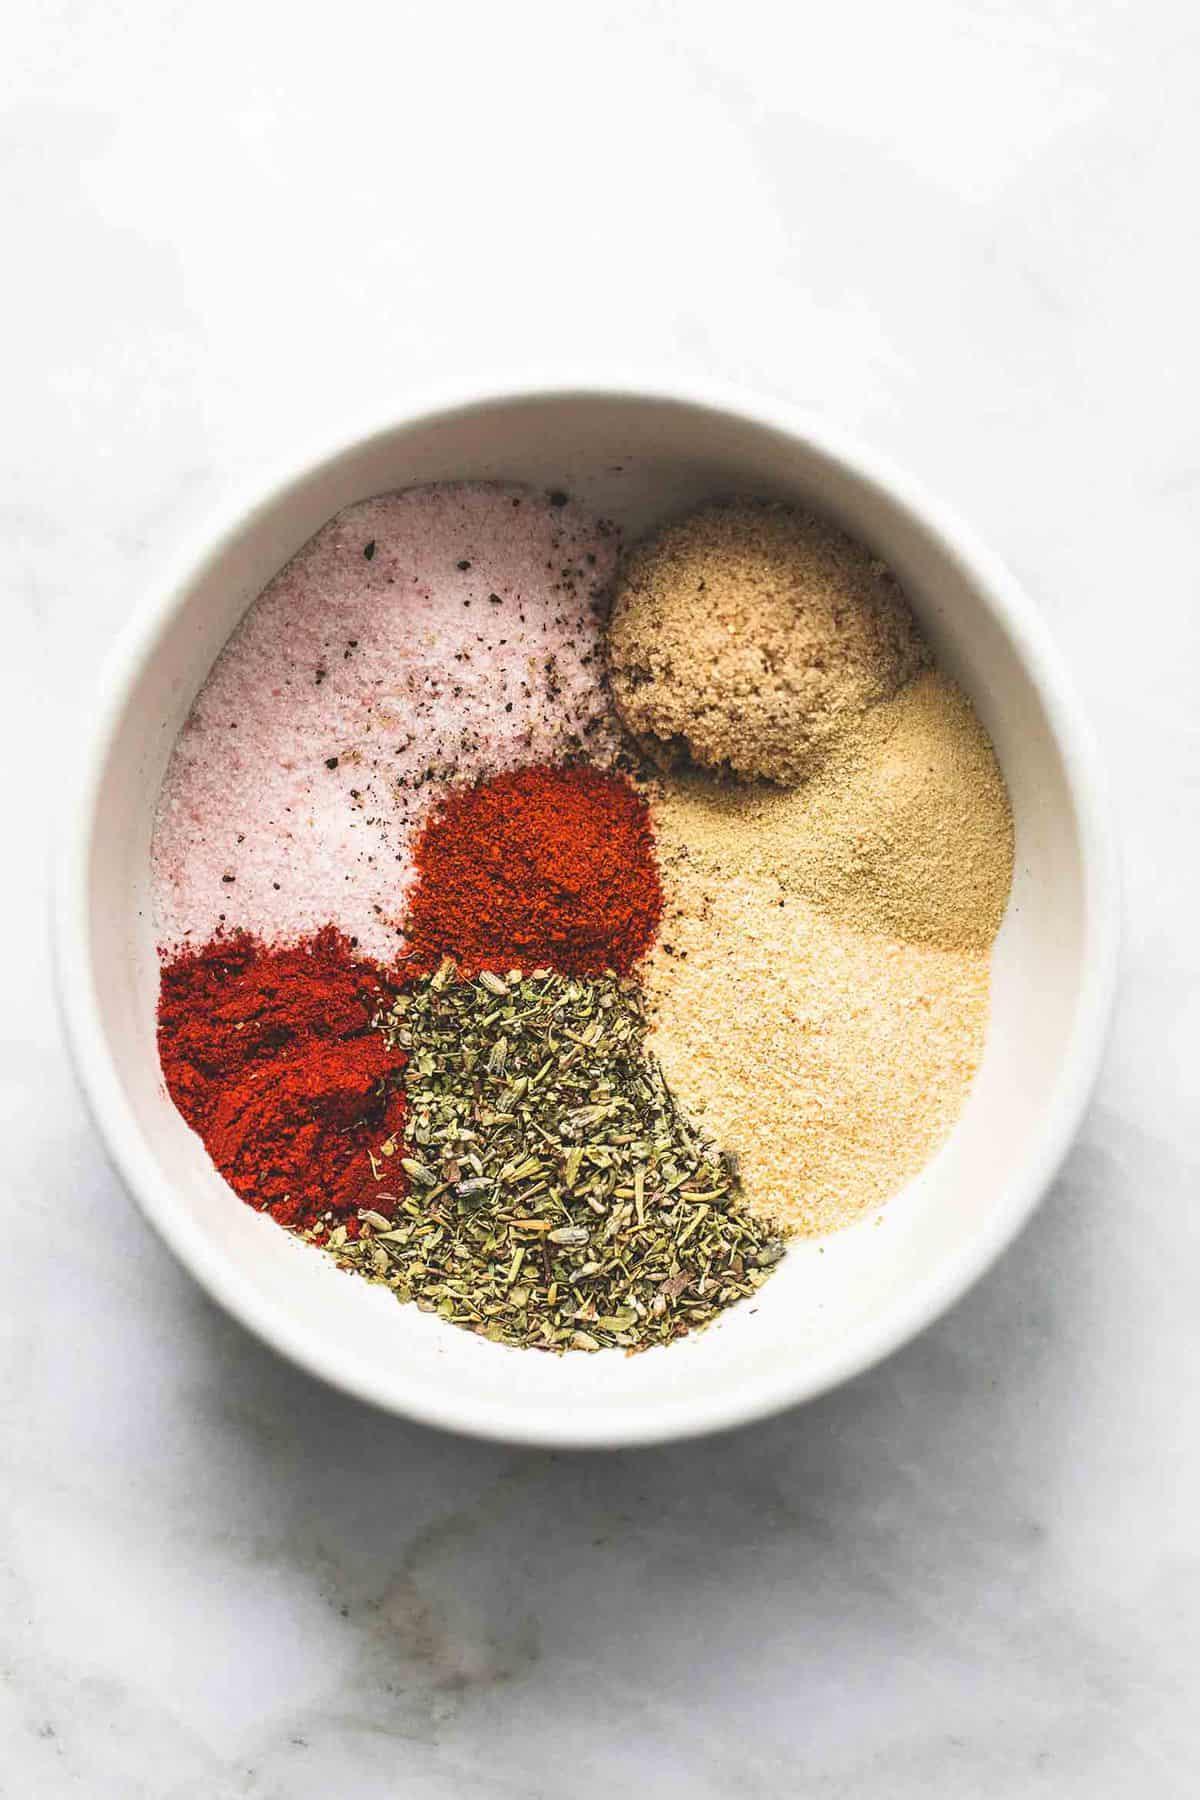 Simple Grilled Chicken Dry Rub easy tasty recipe | lecremedelacrumb.com